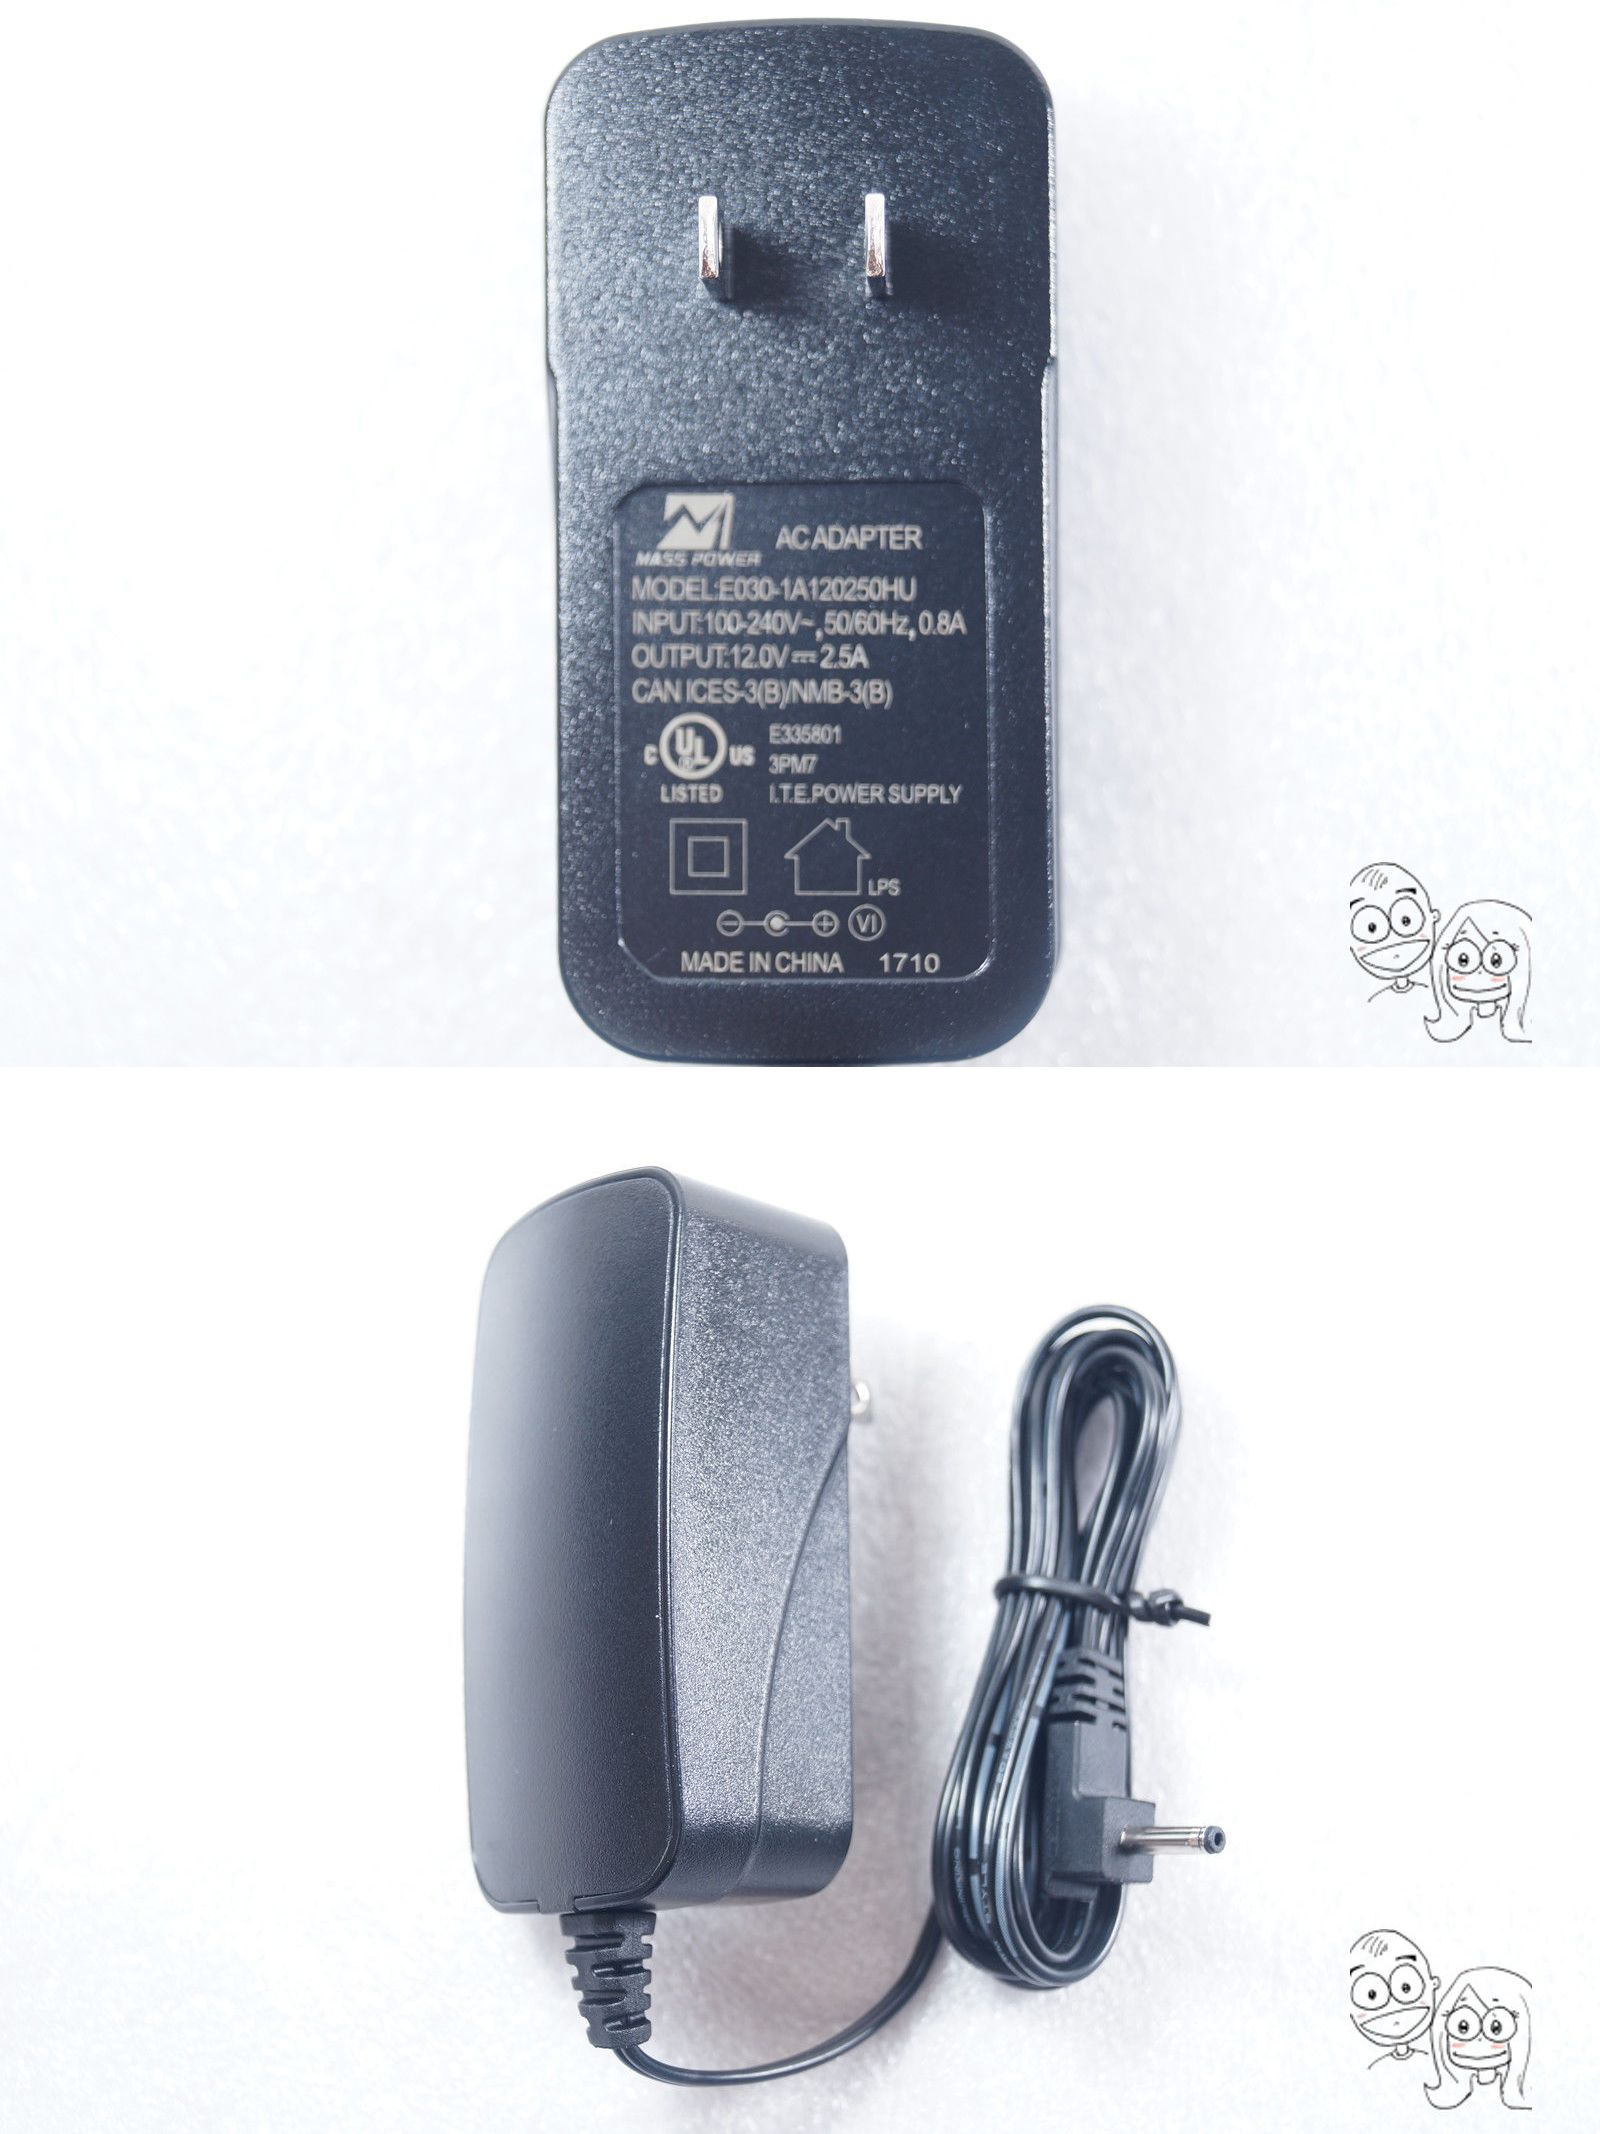 Chargers & Cradles QC35 Bose Revolve Revolve Genuine Bose ...